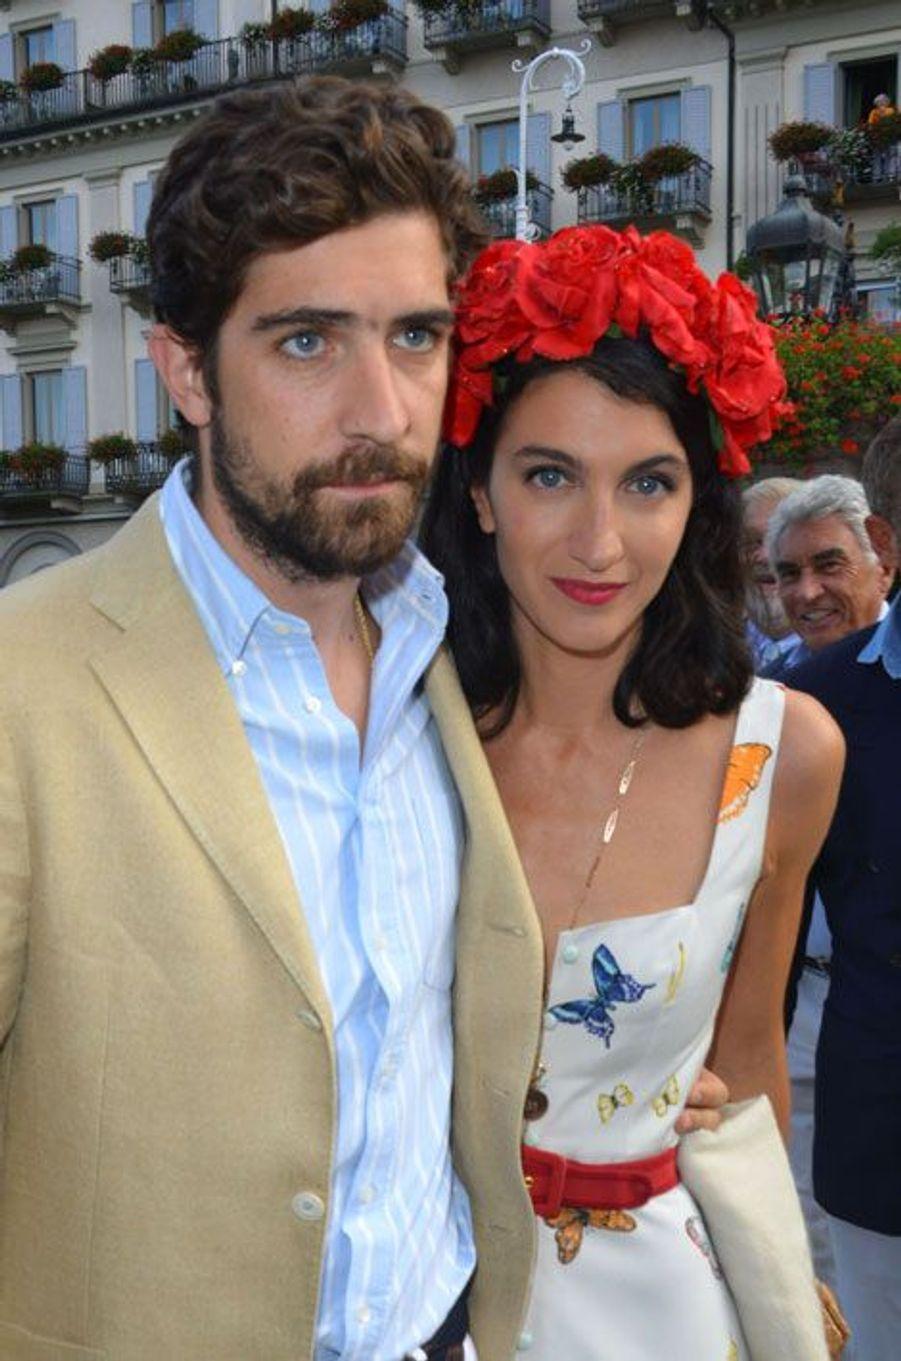 Carlo Borromeo et Marta Ferri